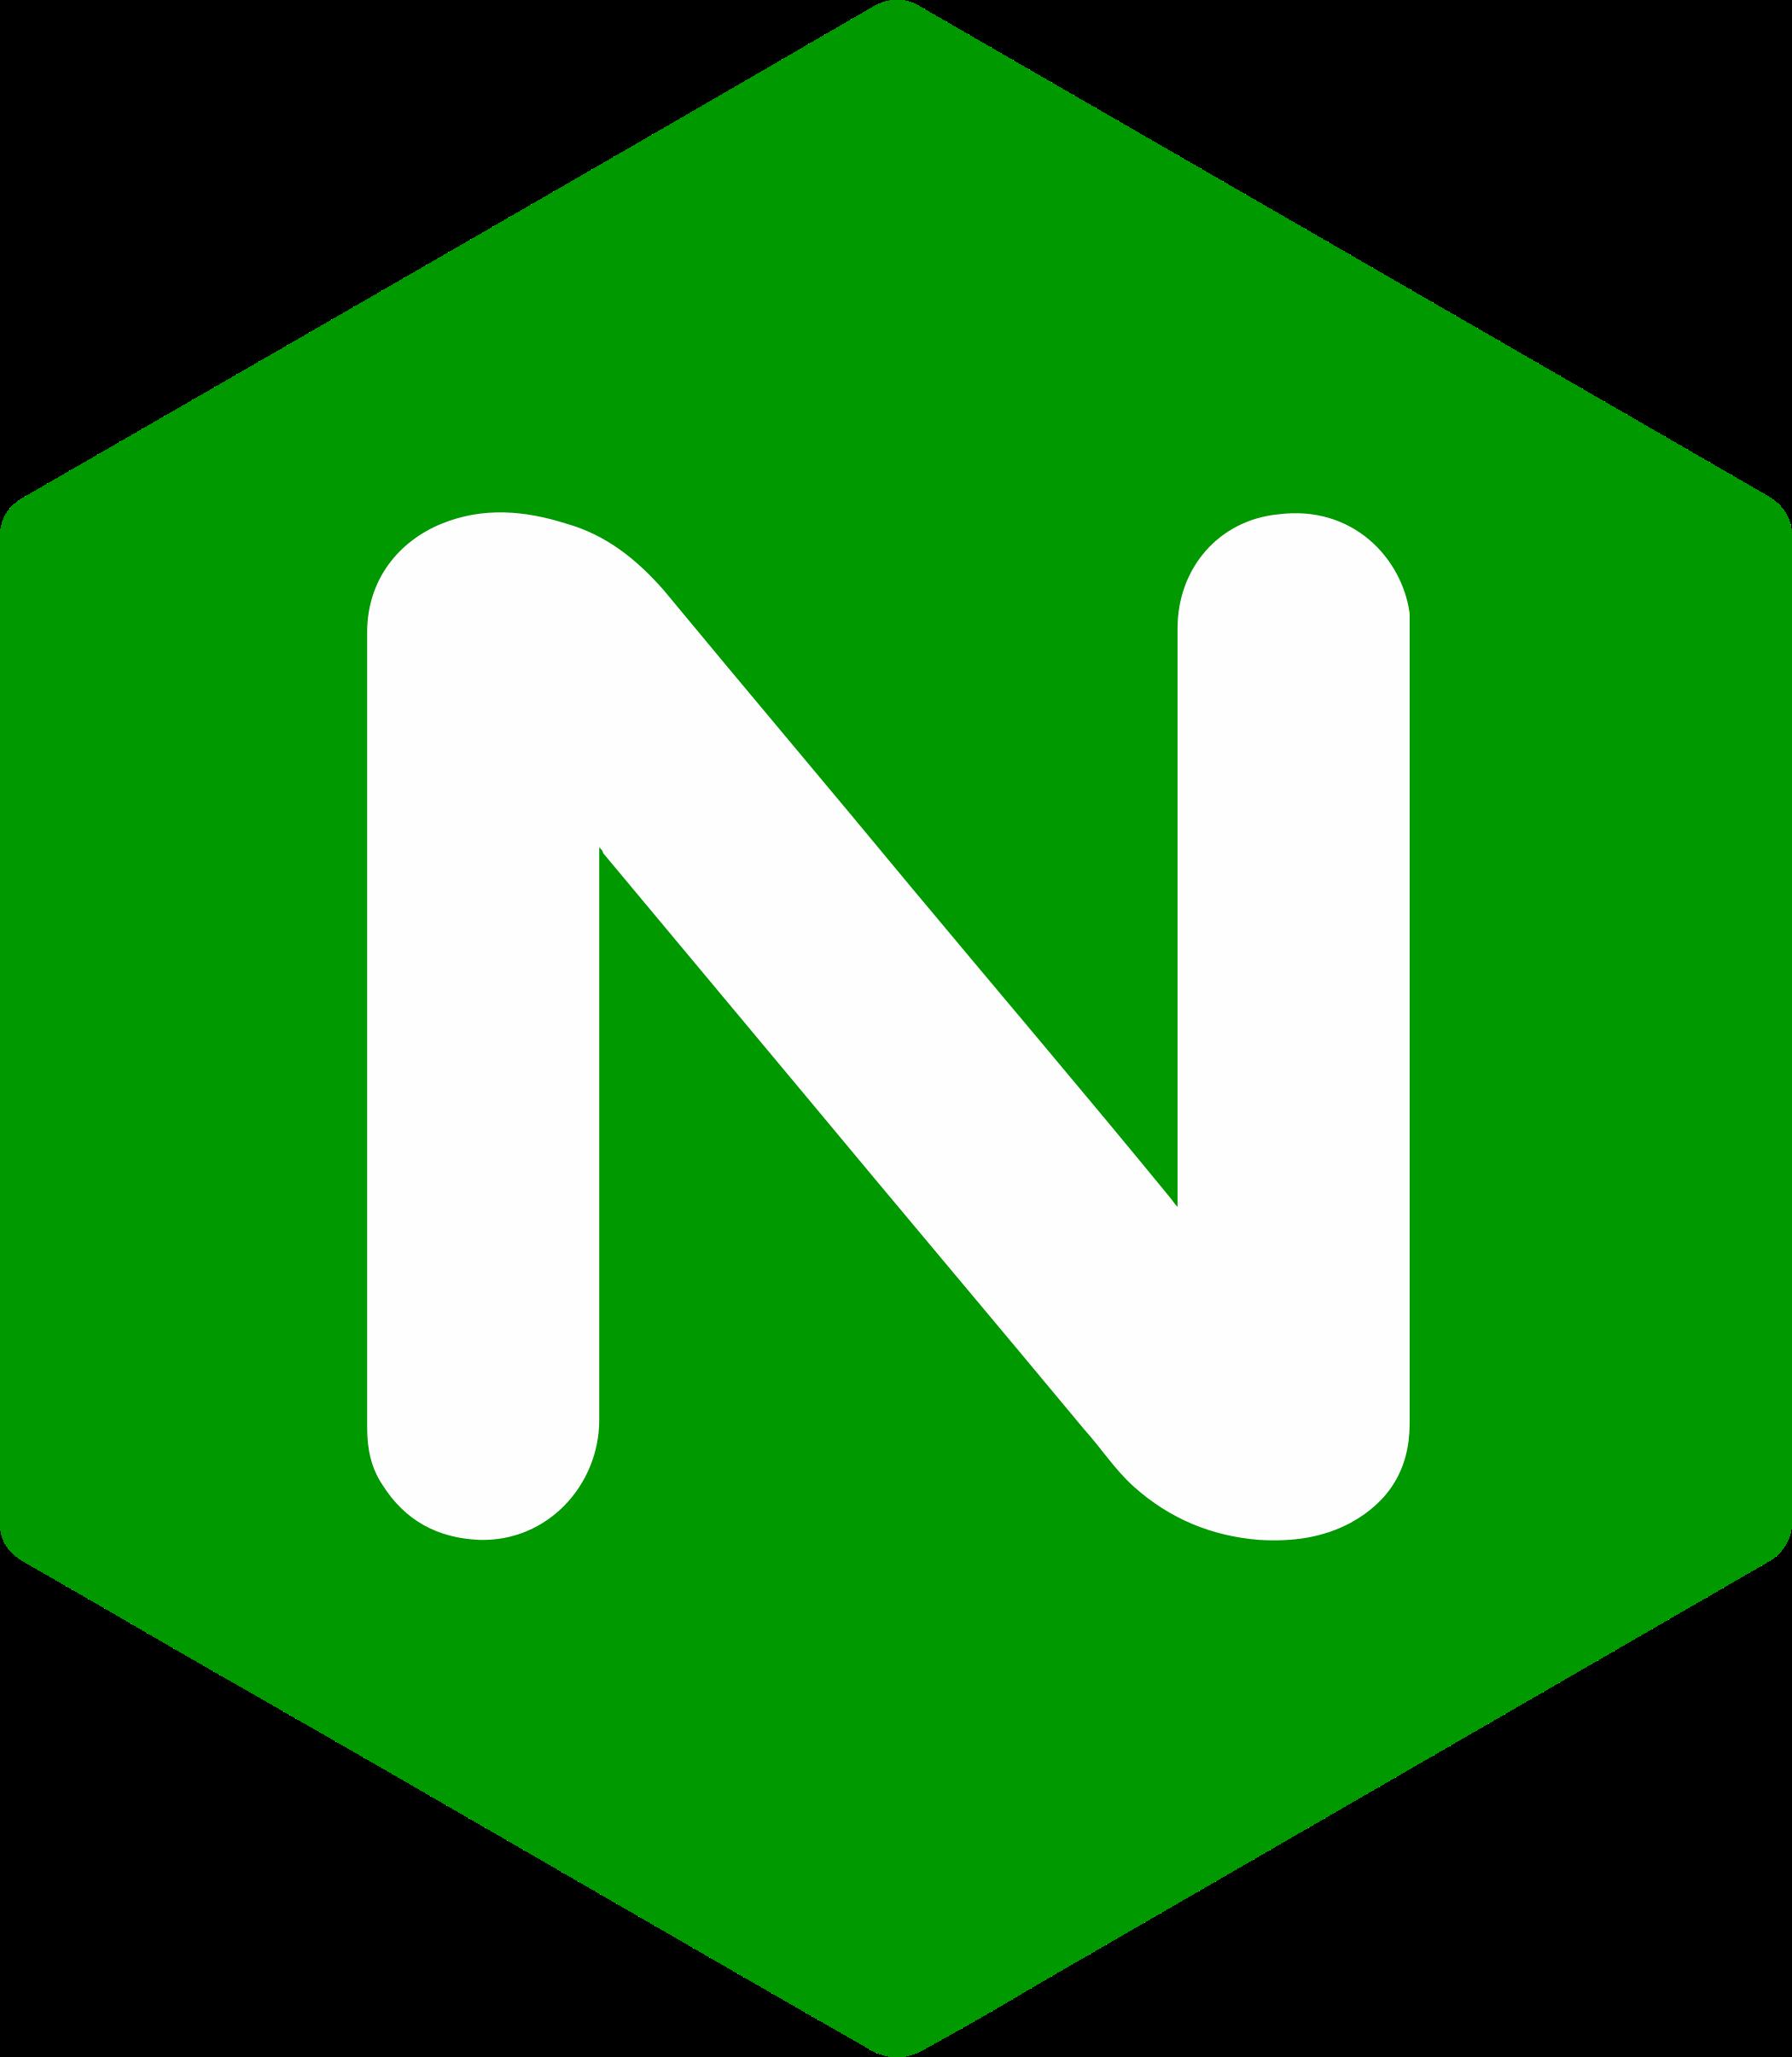 nginx logo 3 - Nginx Logo